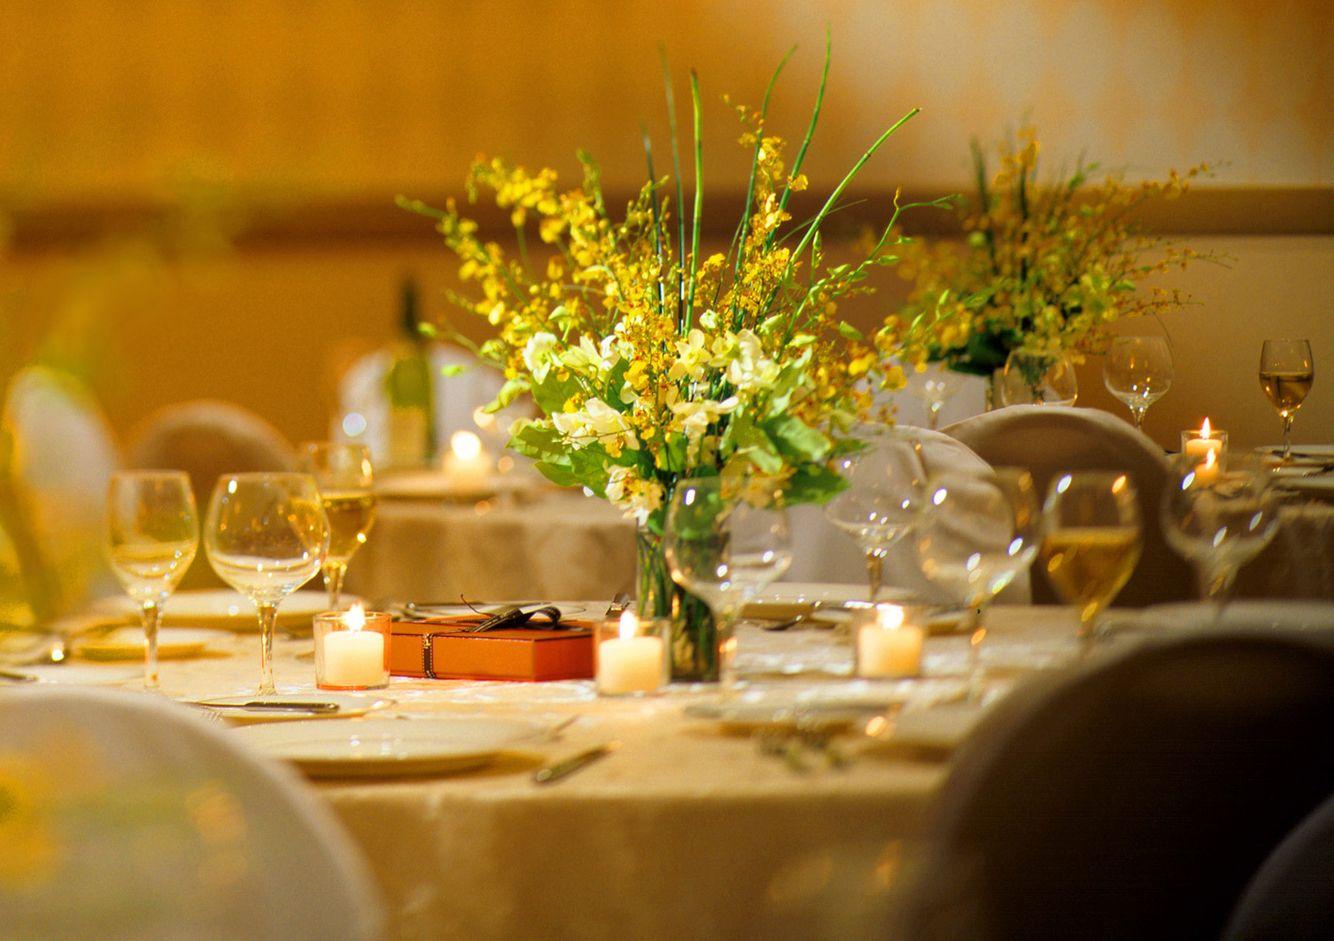 John-Sutton-Photography-Marriott Hotel Ballroom Reception